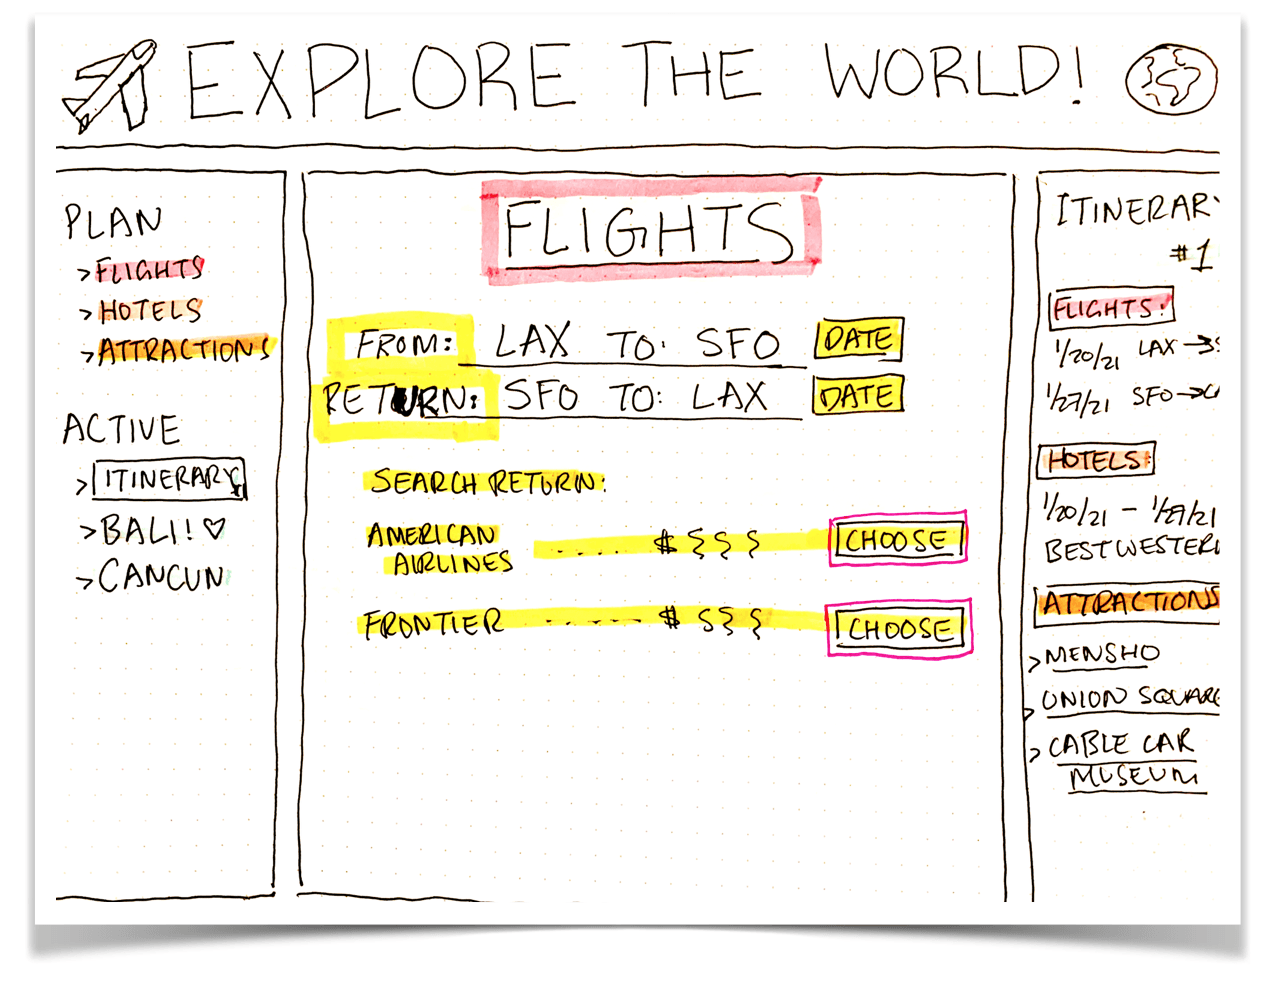 travel app draft with tripadvisor api